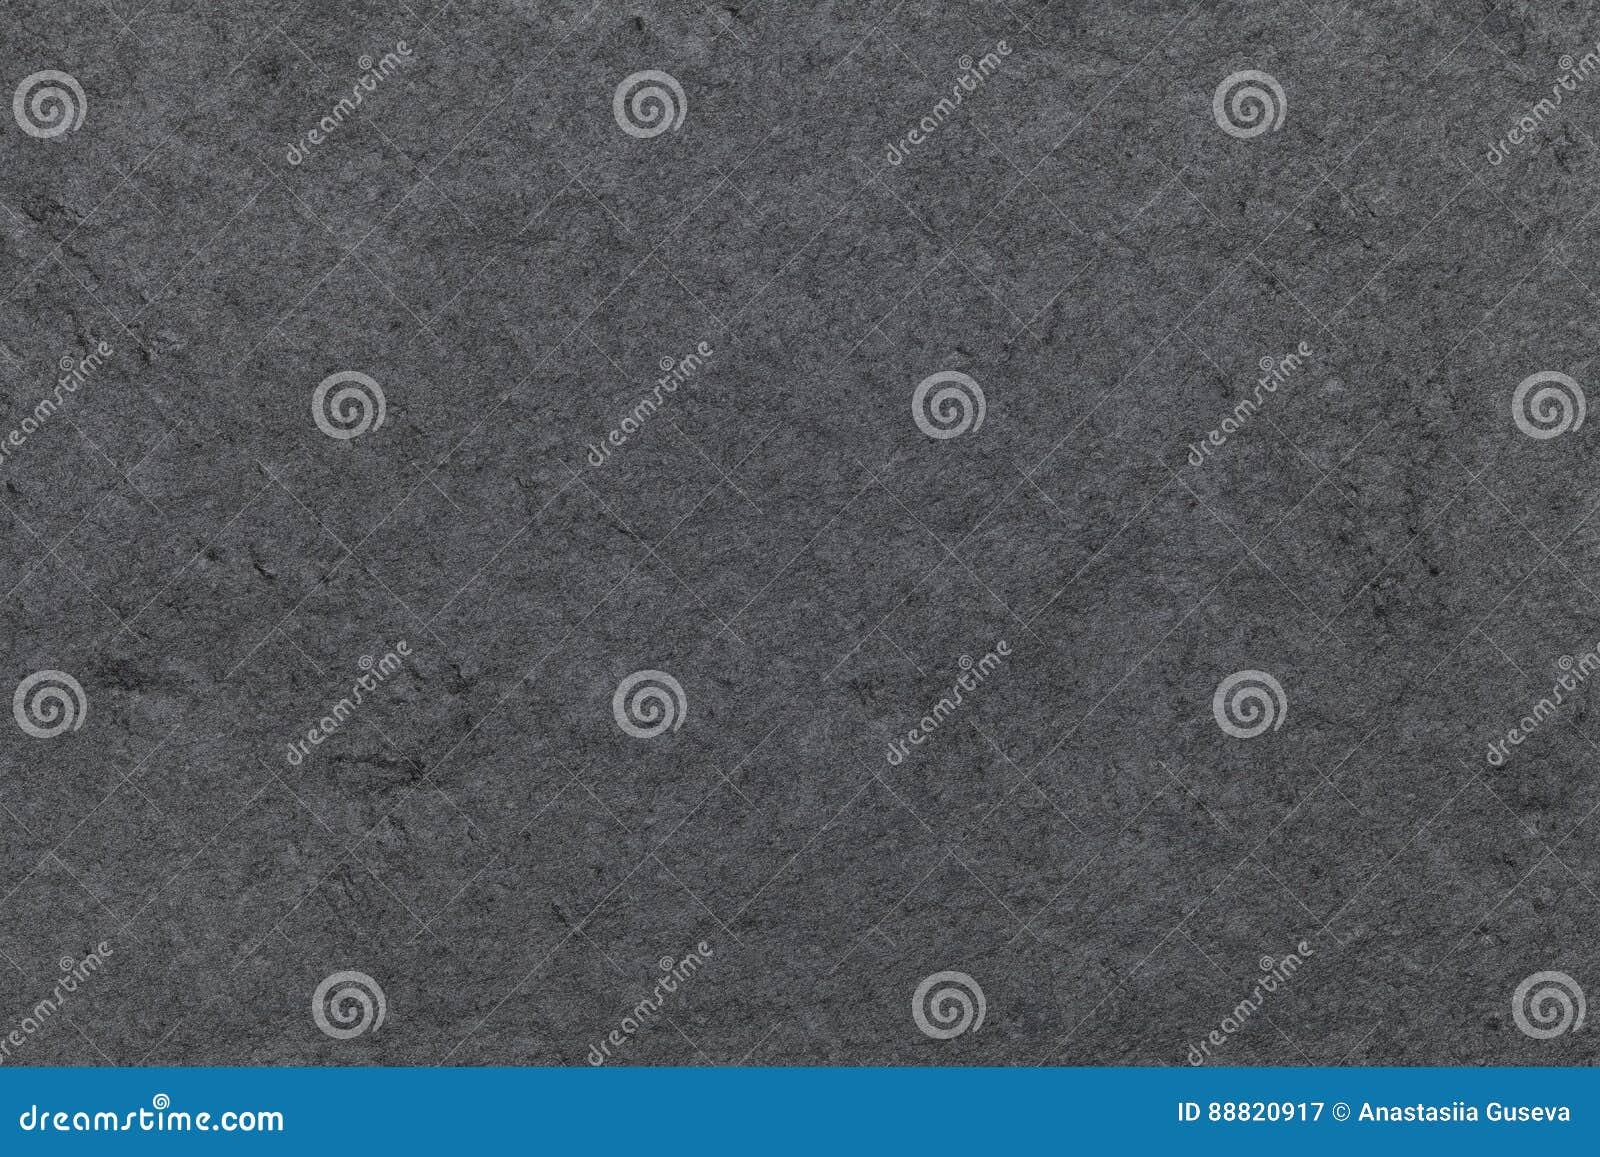 Dark gray background of natural slate. Texture black stone closeup.